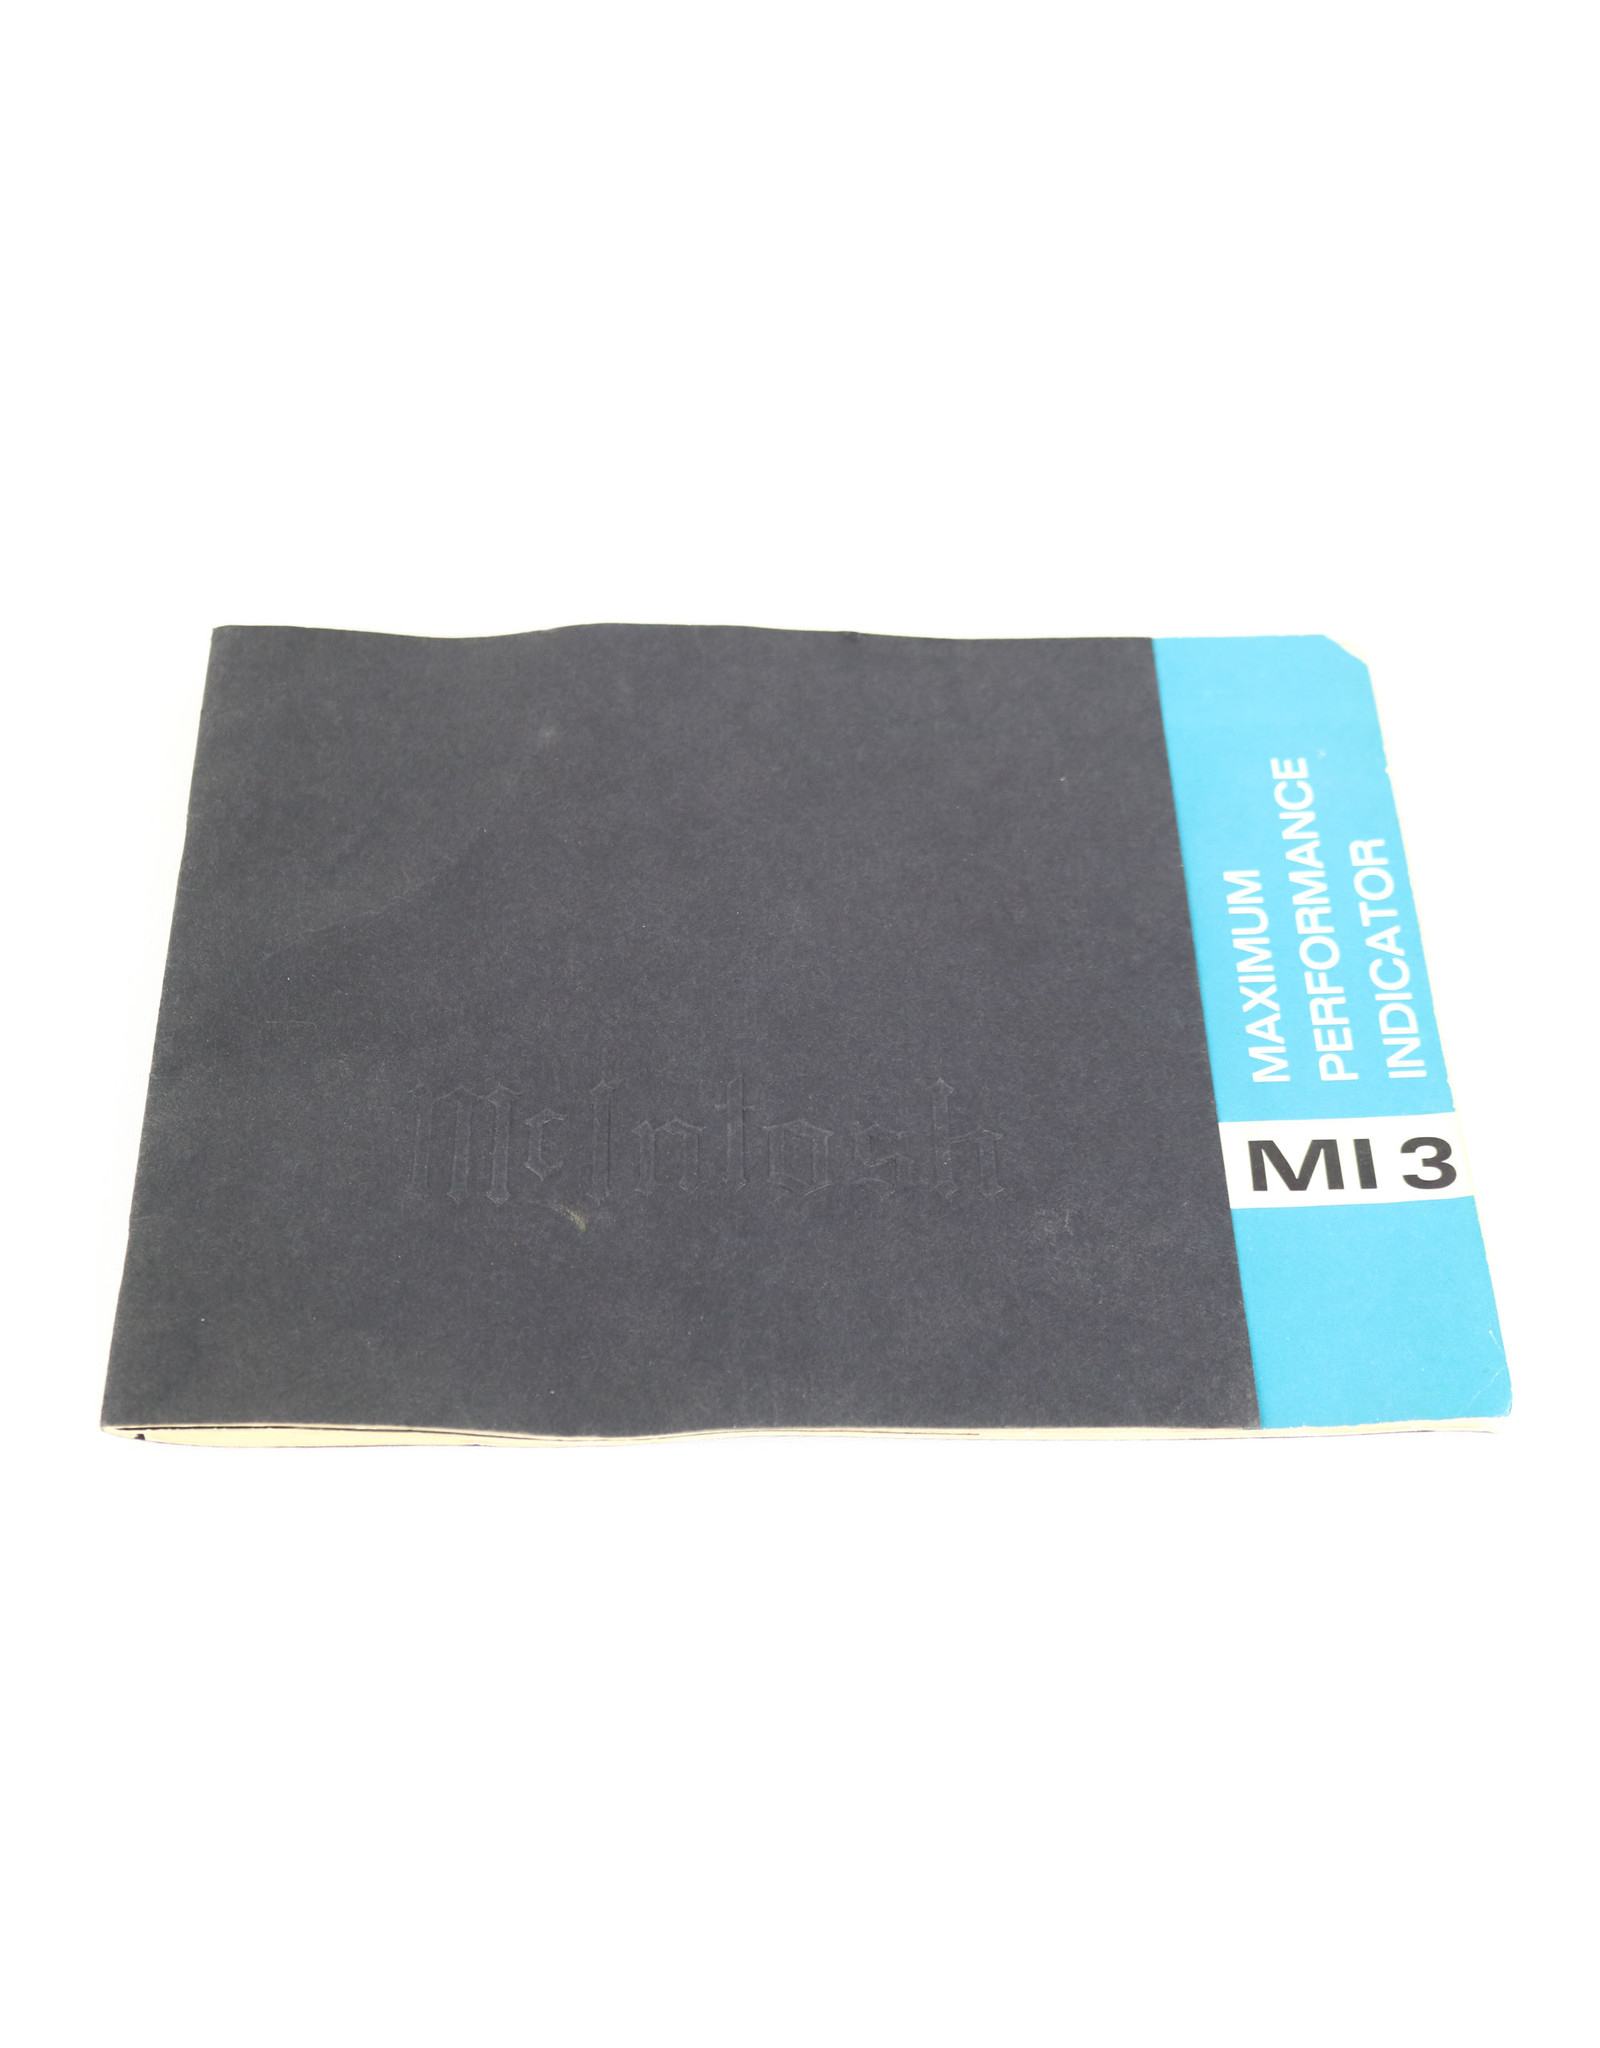 McIntosh McIntosh MI-3 Maximum Performance Indicator USED